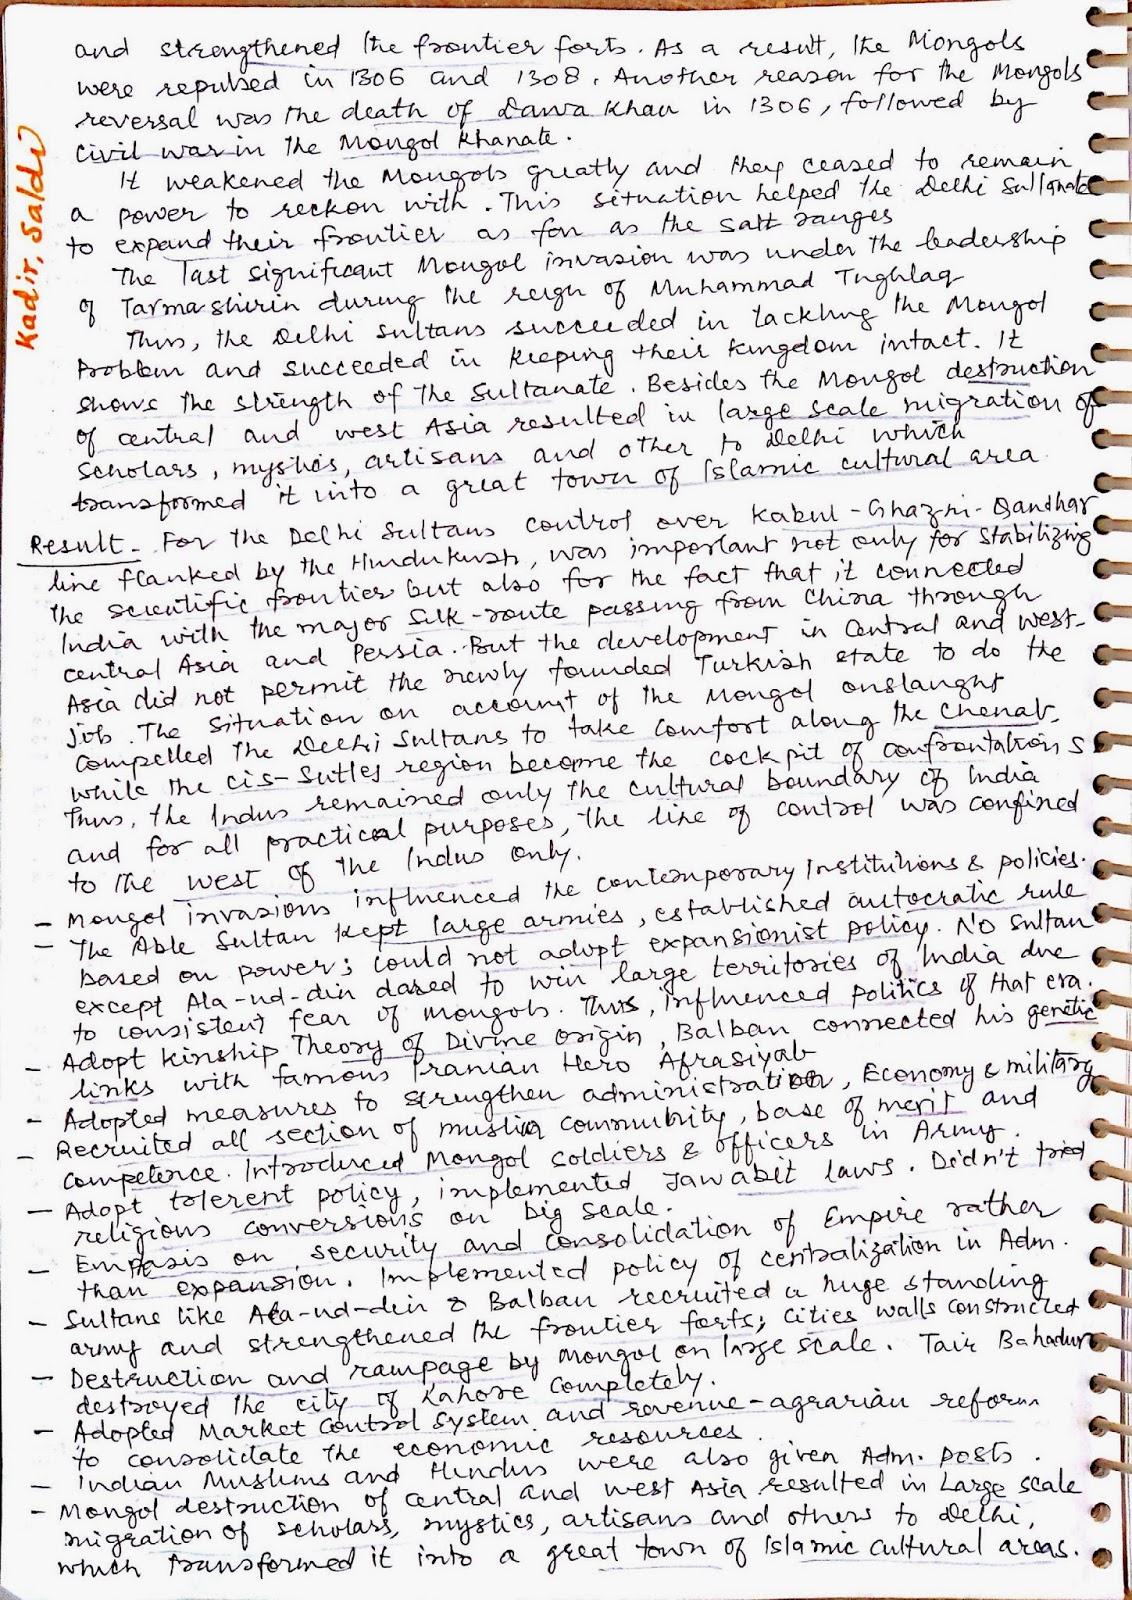 ias 16 full text pdf